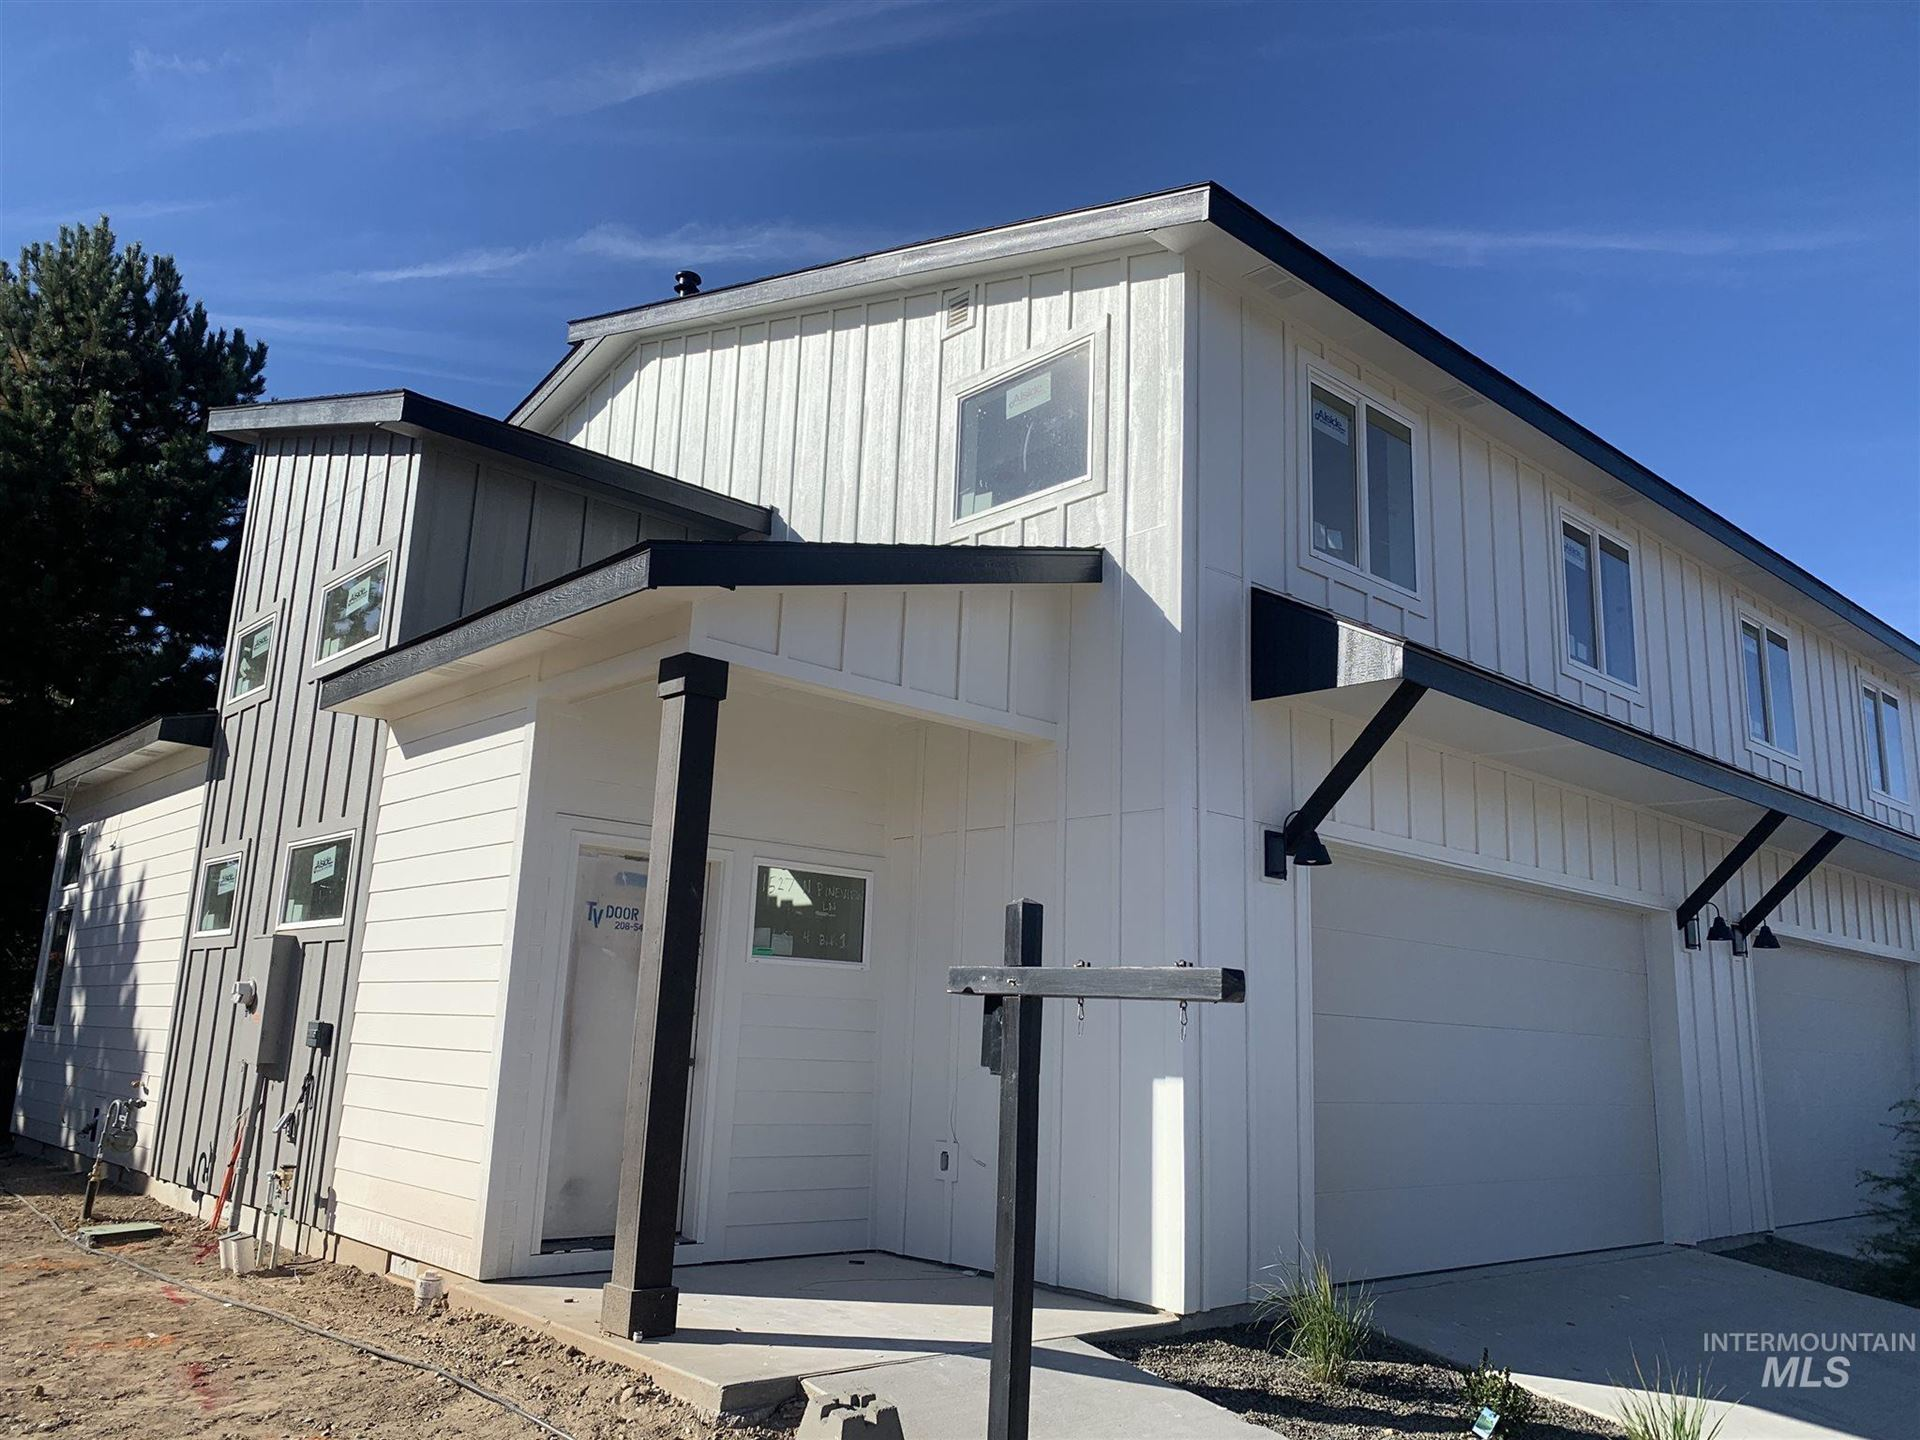 Photo of 1527 N Pineview Ln, Boise, ID 83713 (MLS # 98784609)